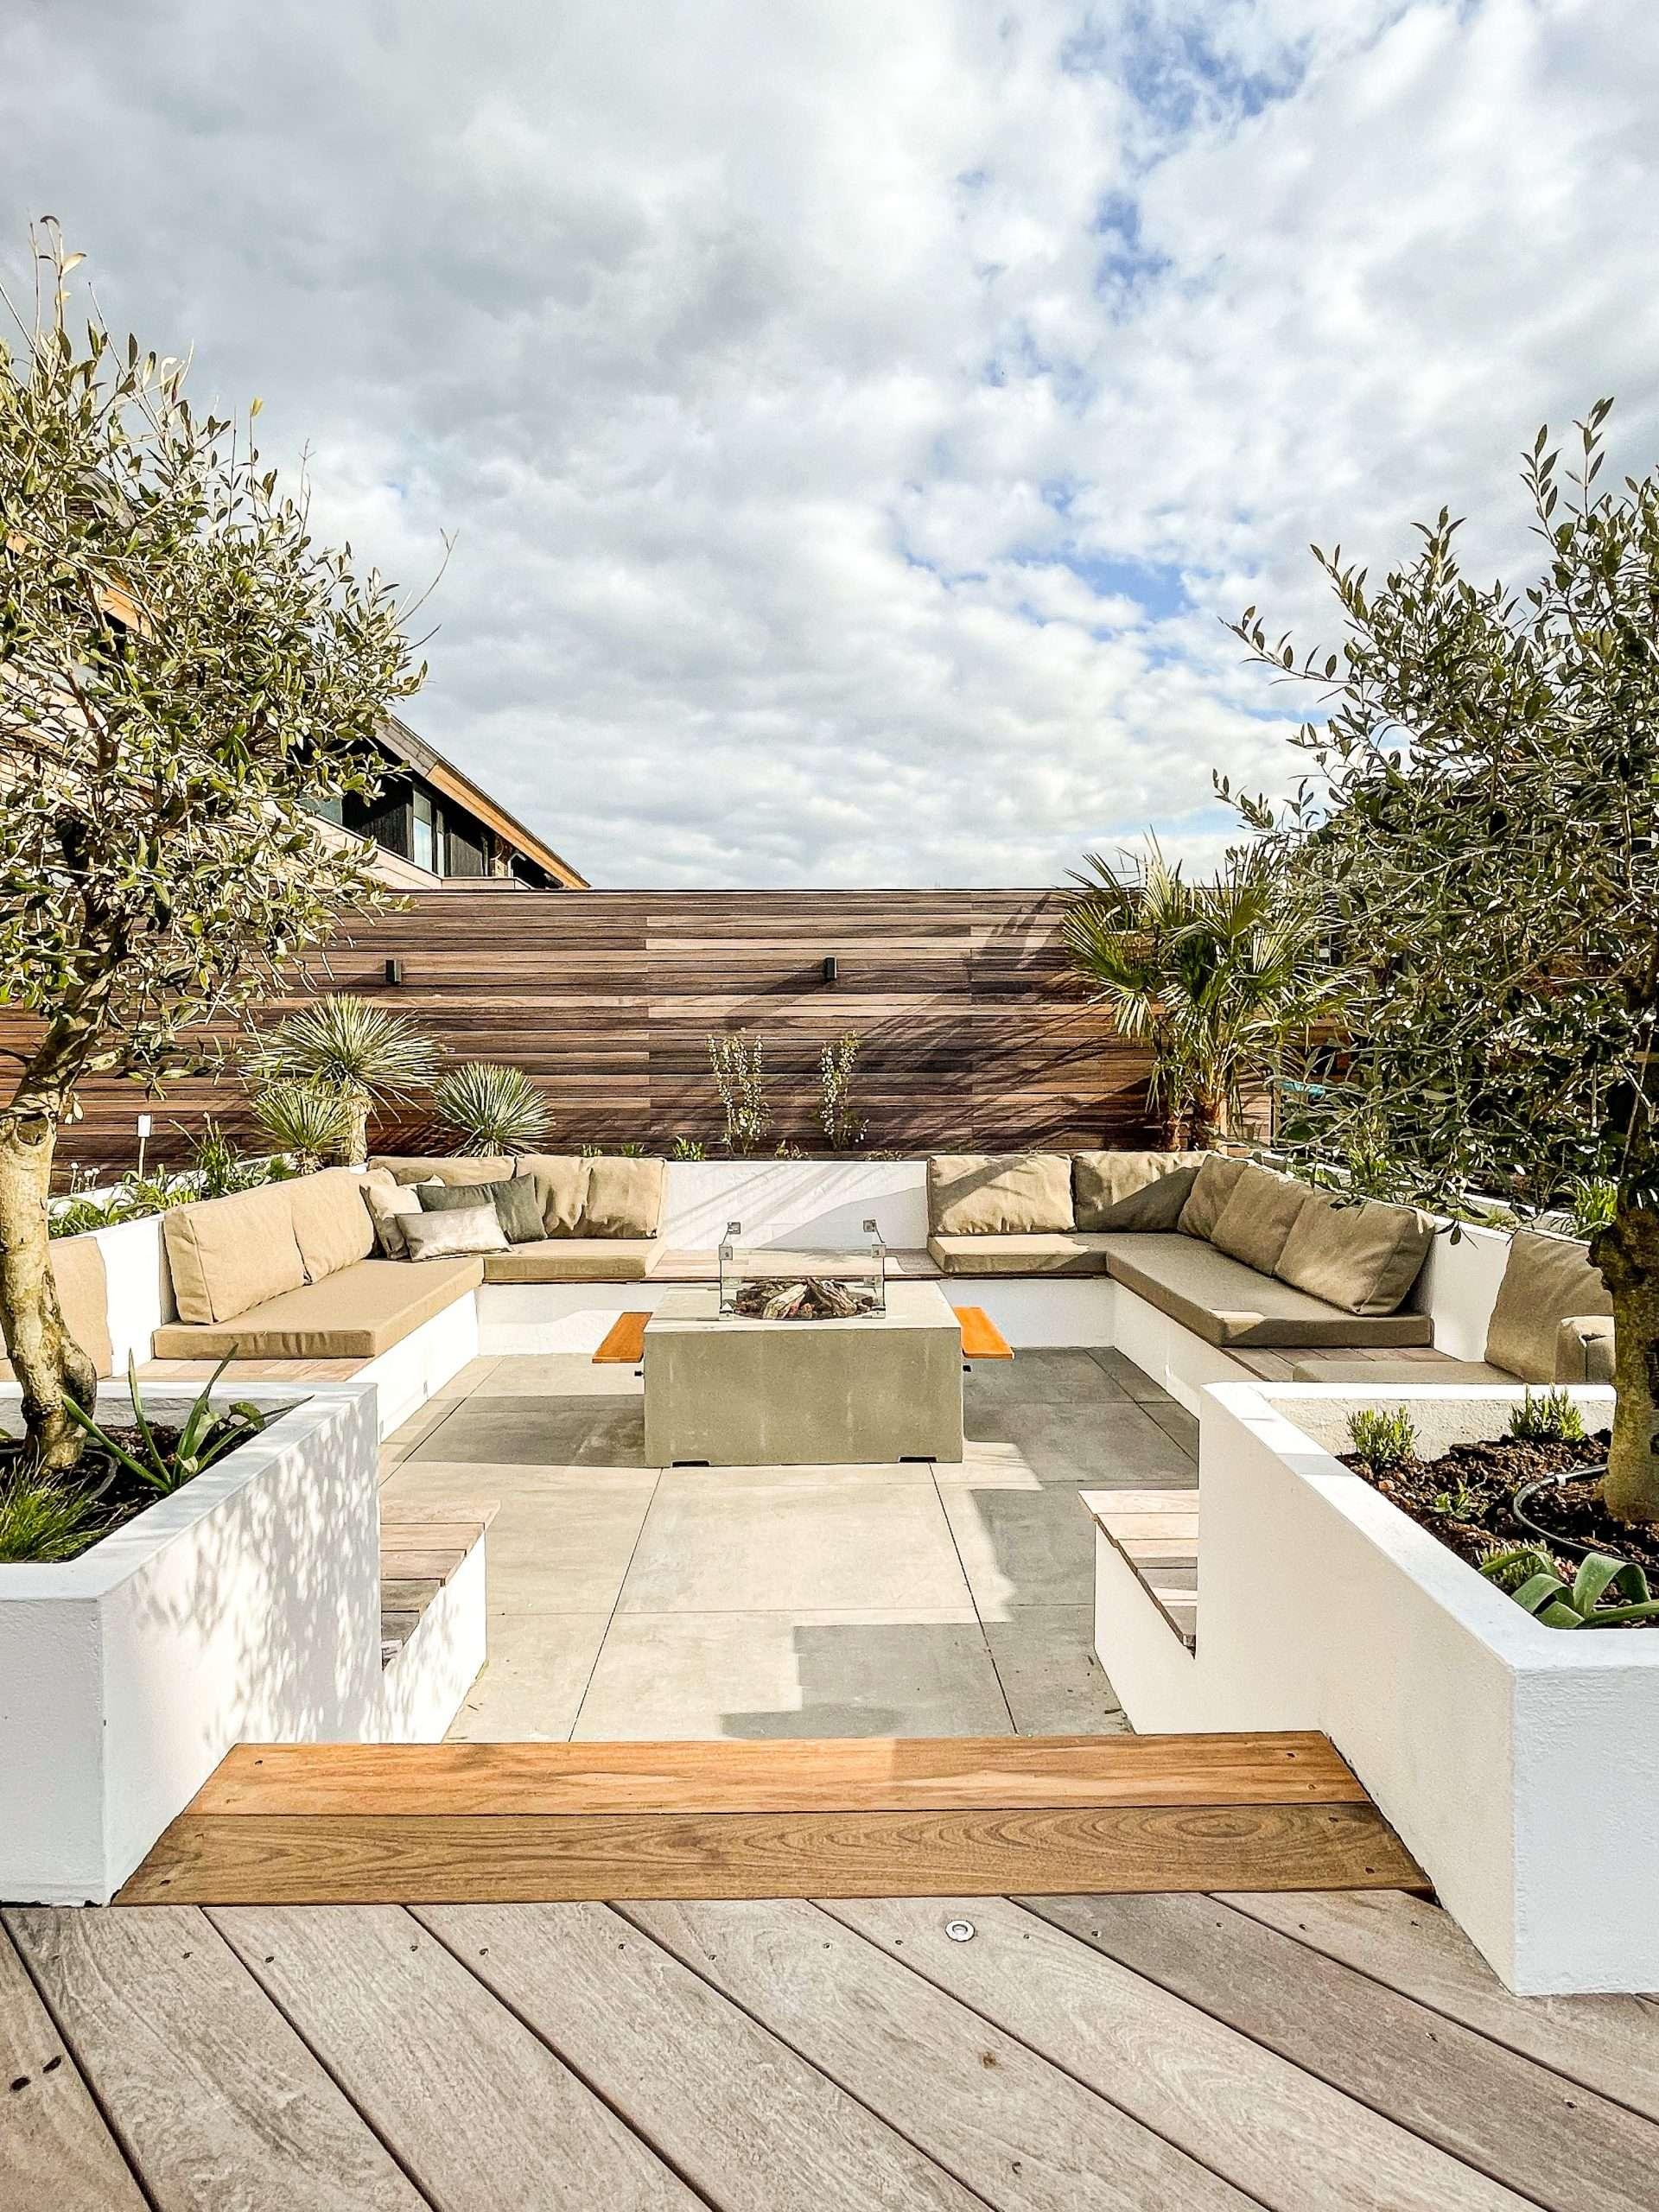 Nieuwbouwwoning met mediterrane tuin